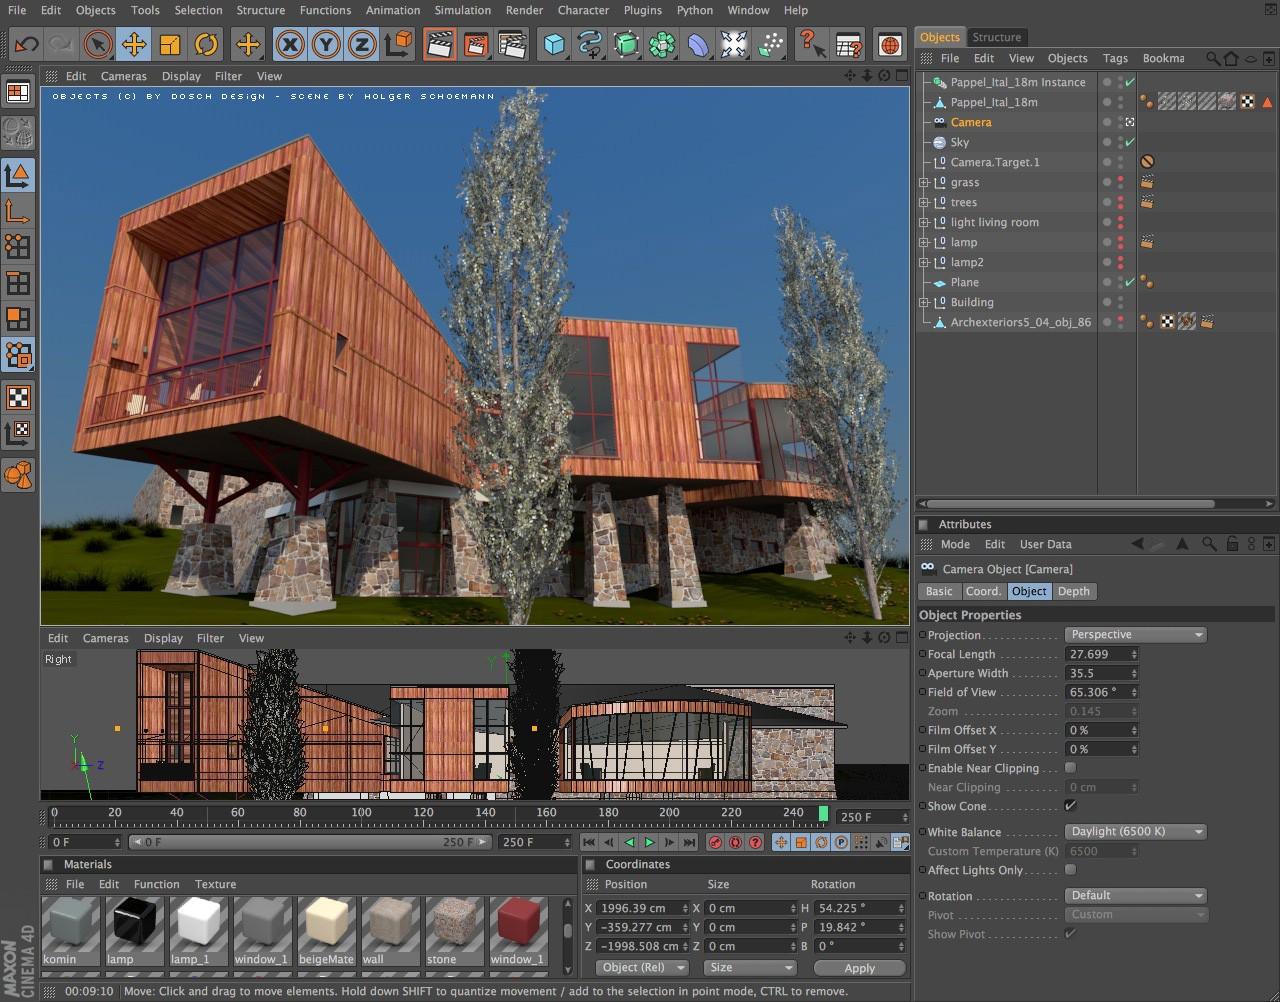 Maxon: Cinema 4D Release 12 rendert besser - Cinema 4D Visualize Release 12